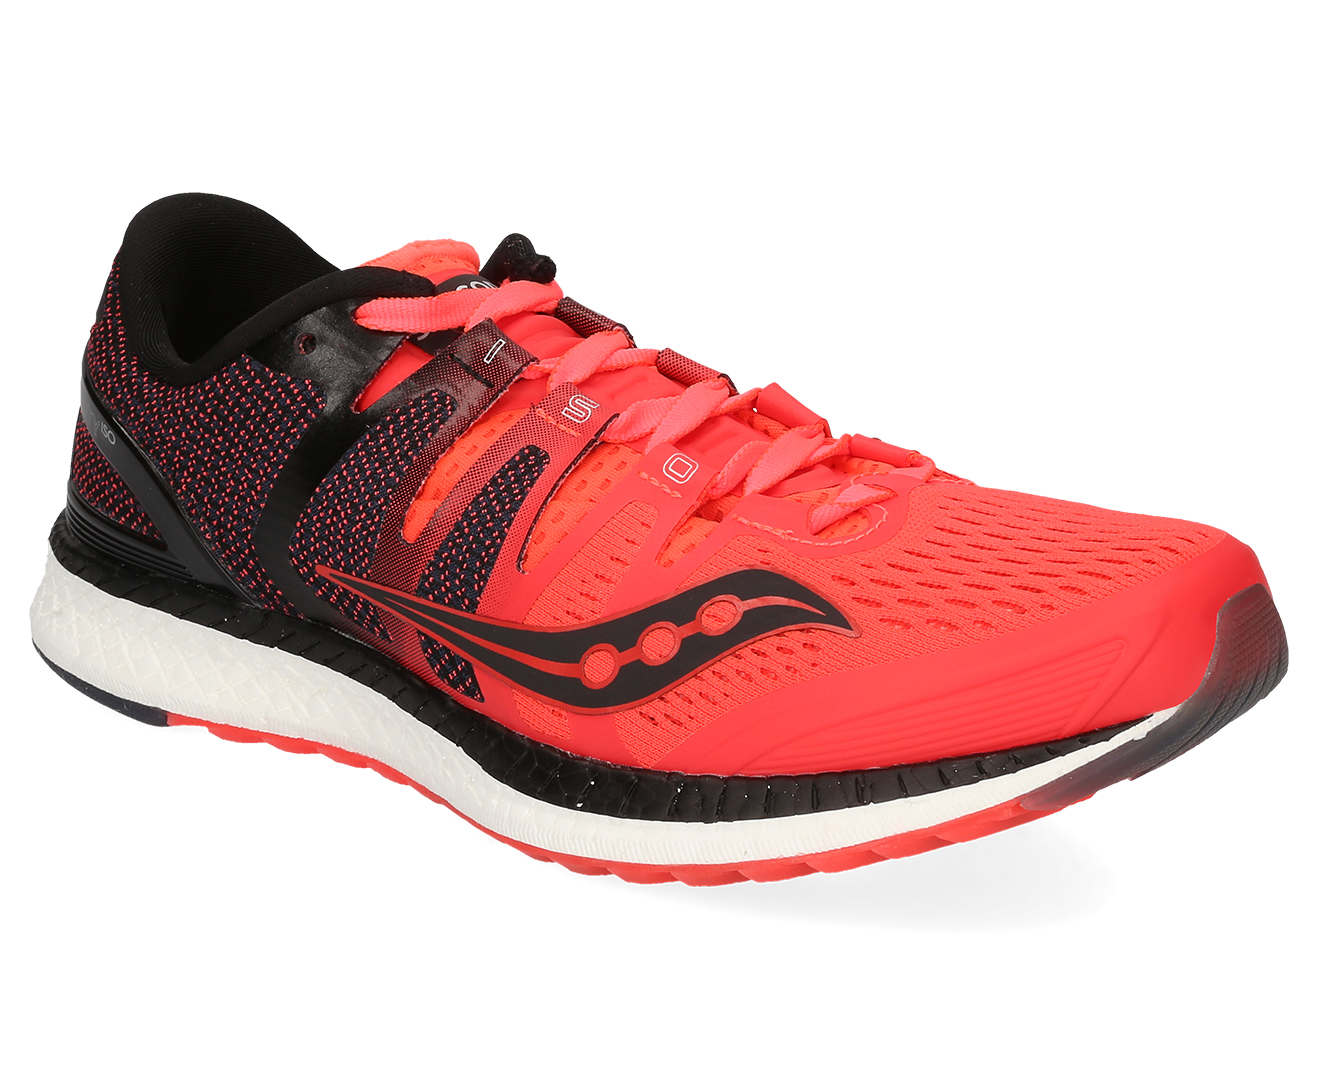 16abdab22149 Saucony Women s Liberty ISO 4 Shoe - Vizi Red Black Grey